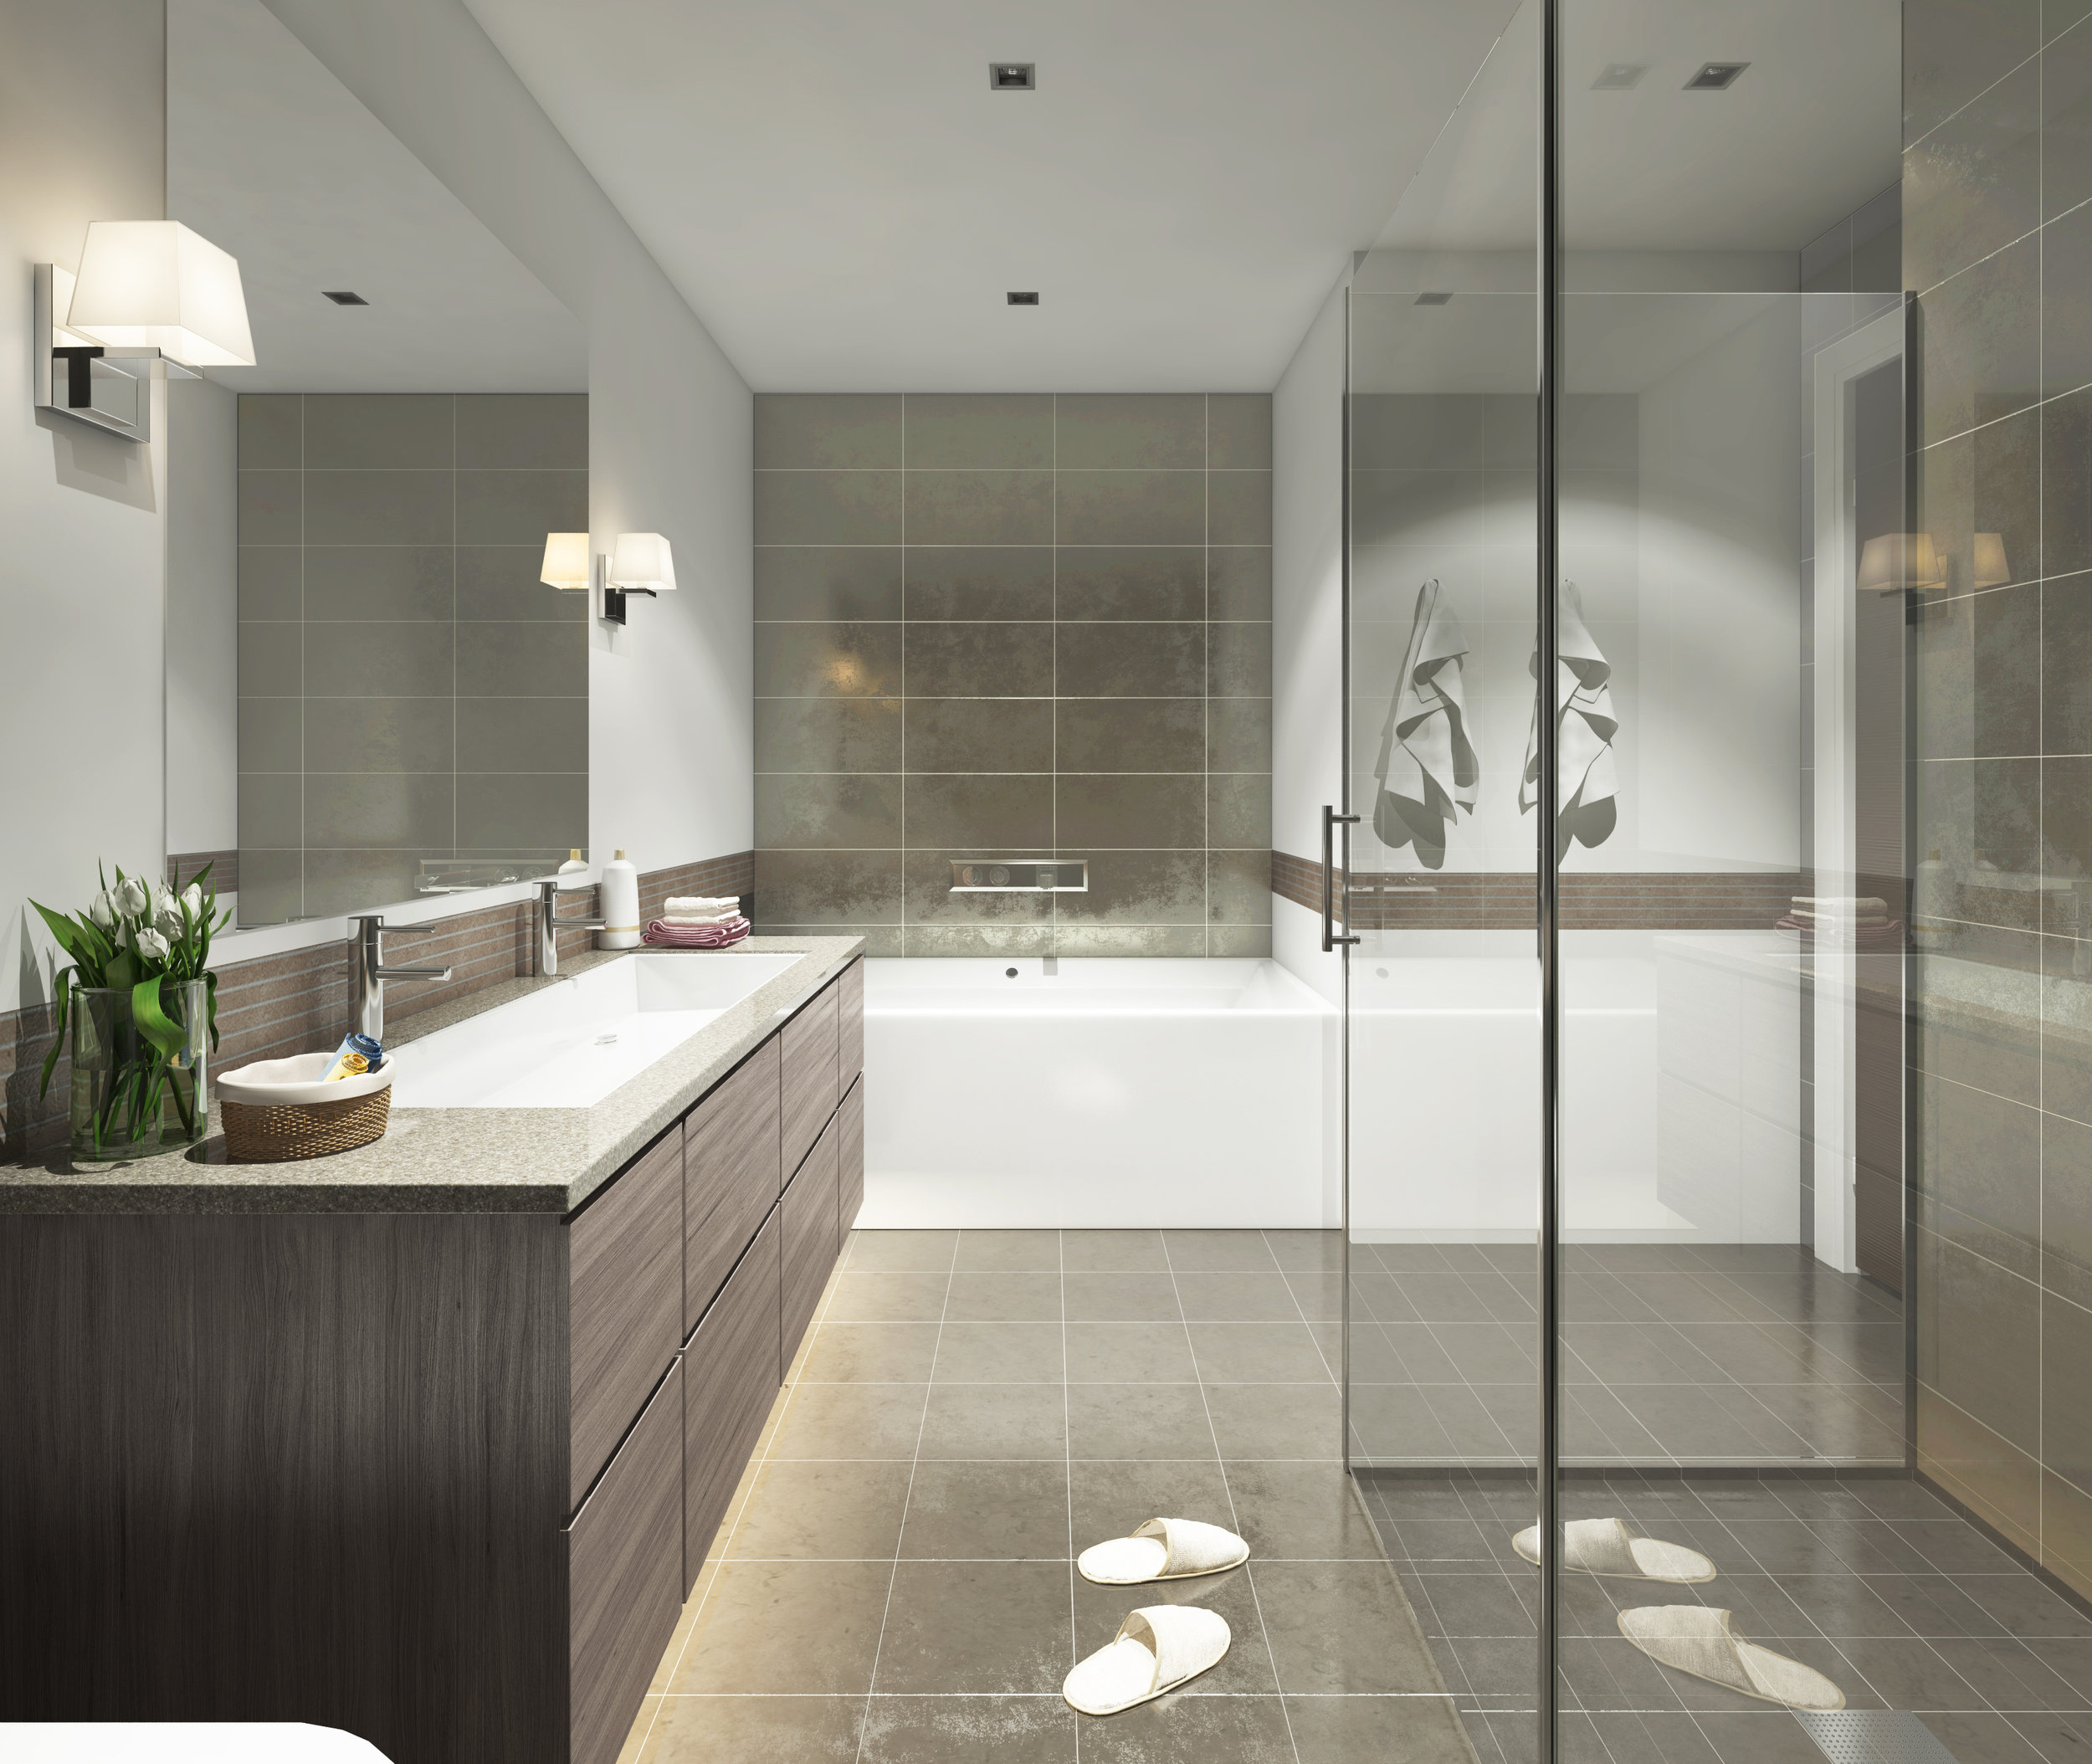 LakeSide_Bathroom.jpg